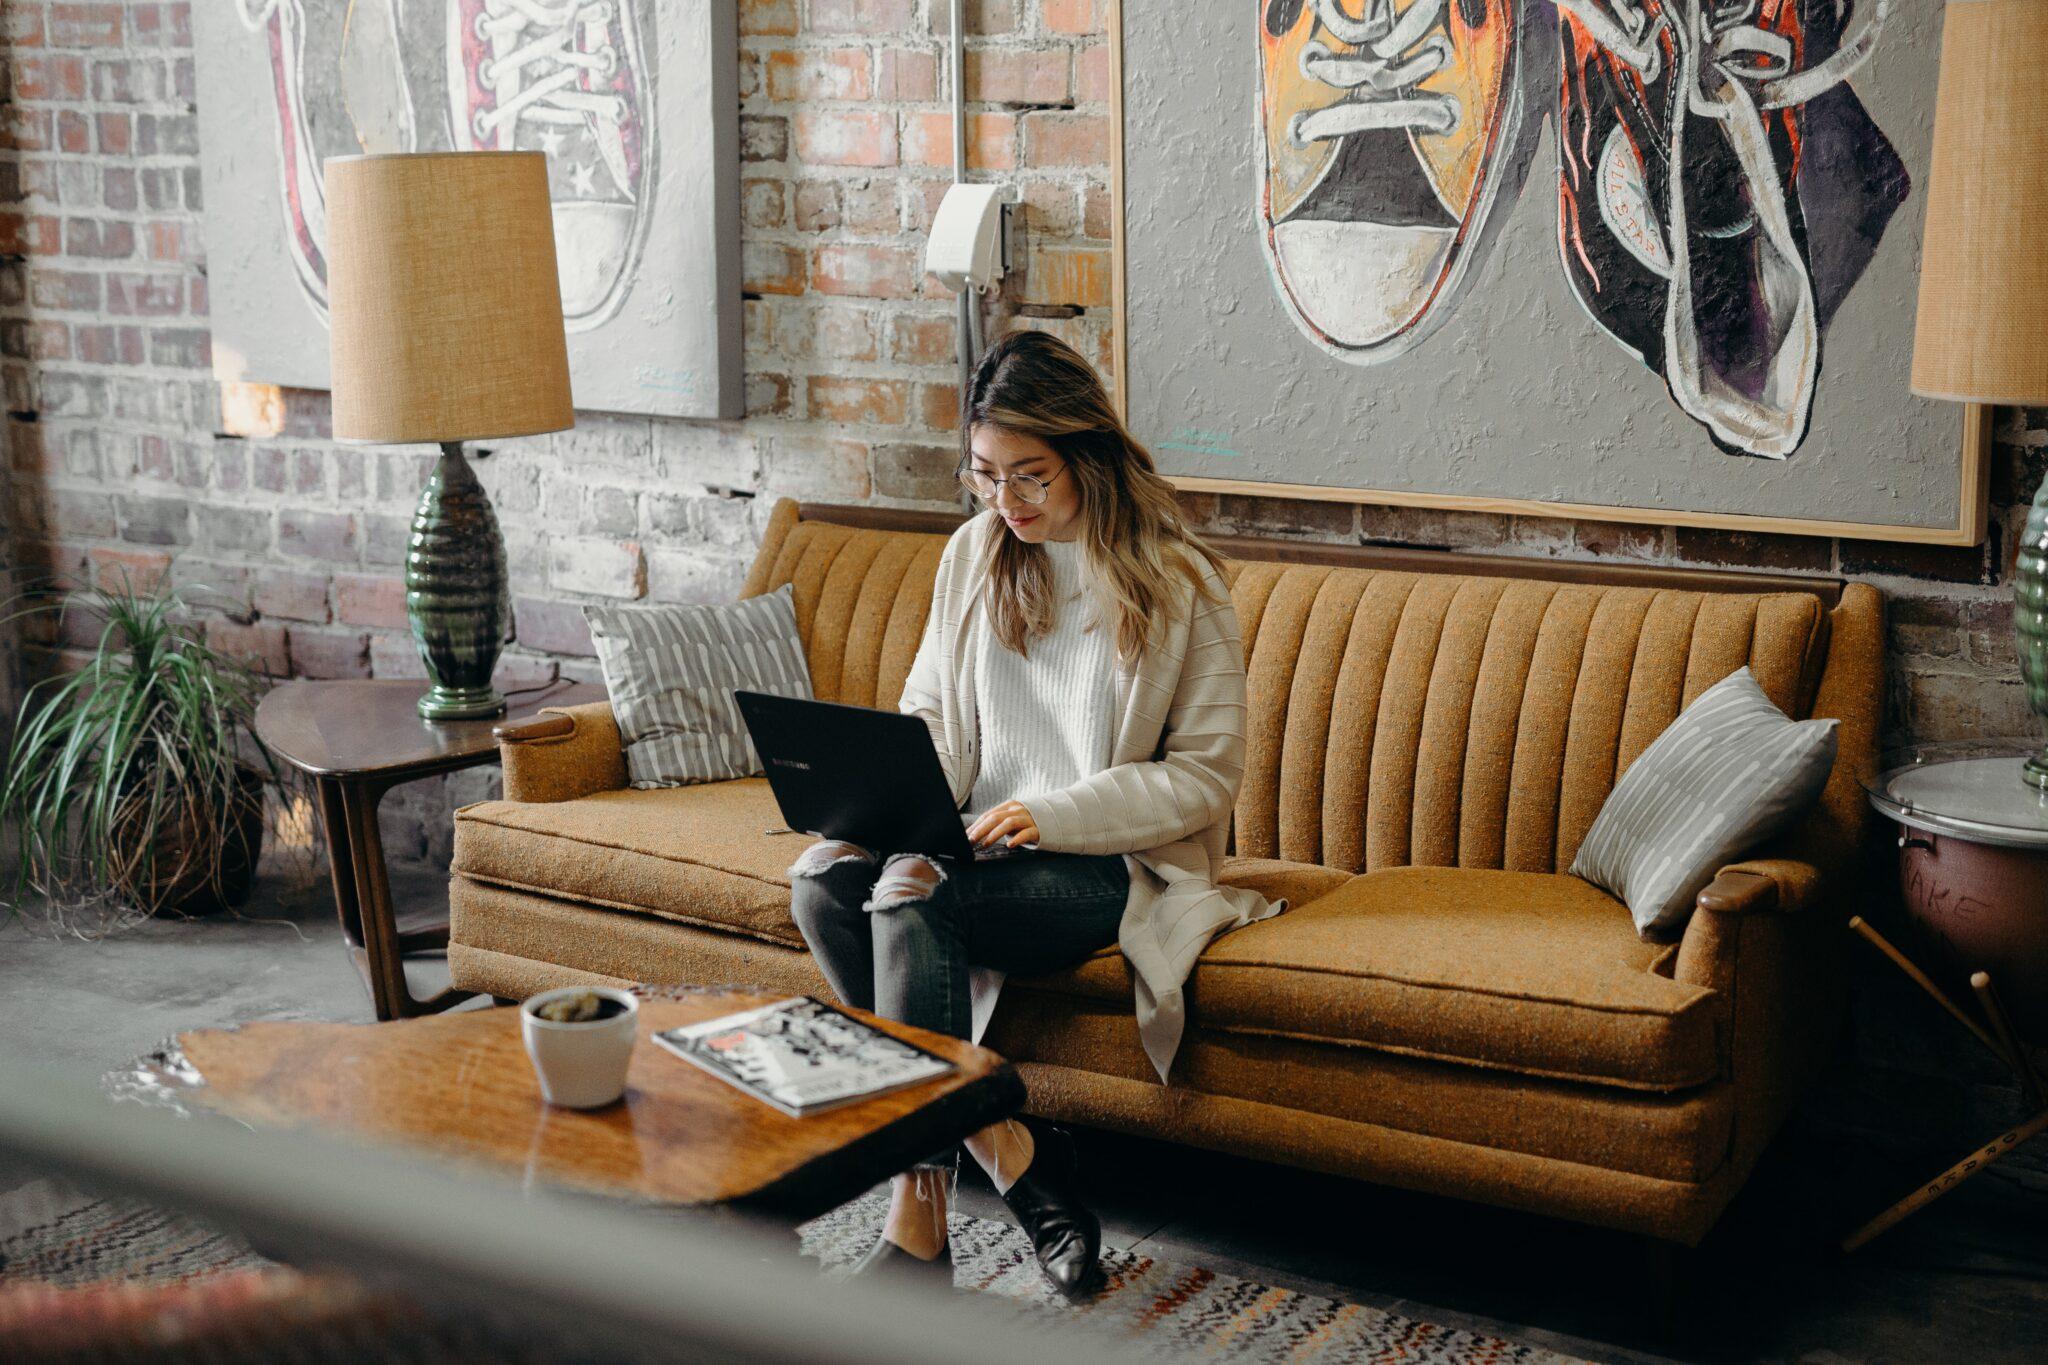 Woman using laptop while sitting on sofa